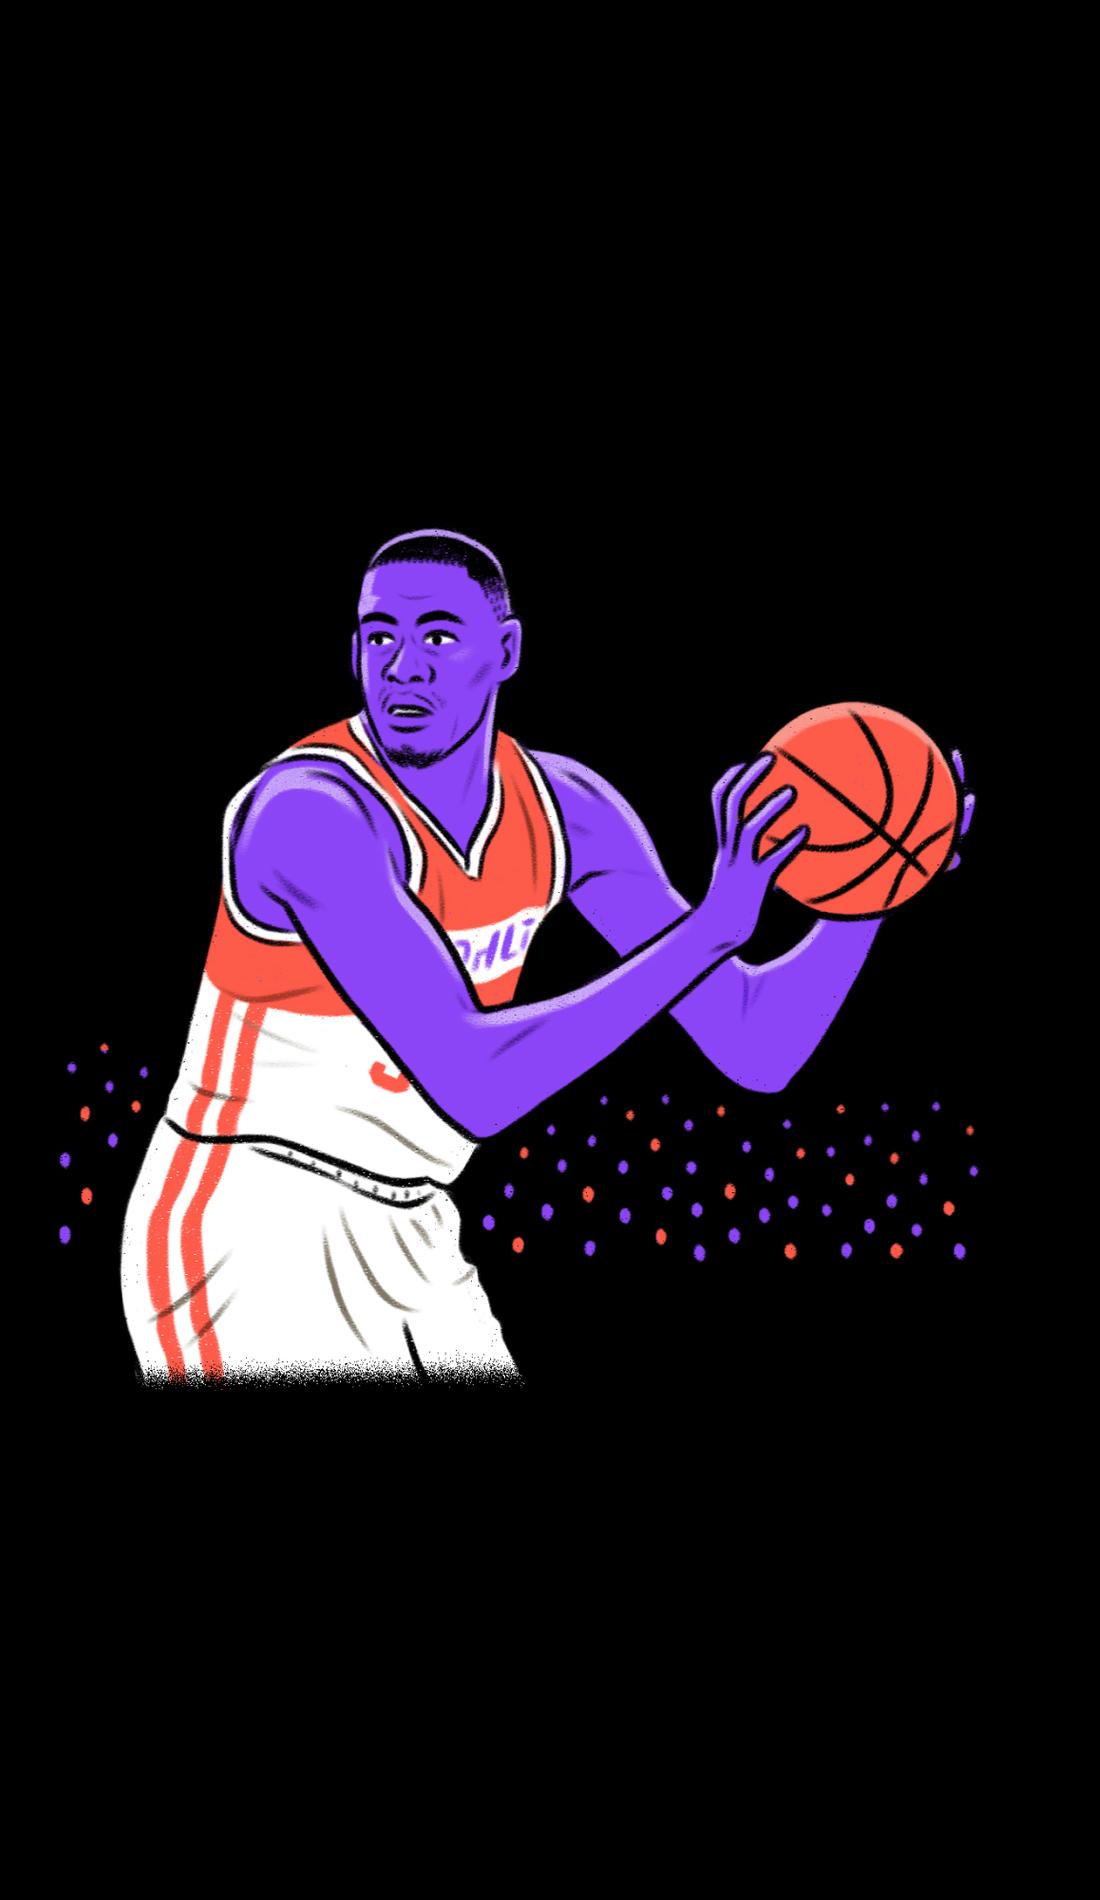 A Utah State Aggies Basketball live event